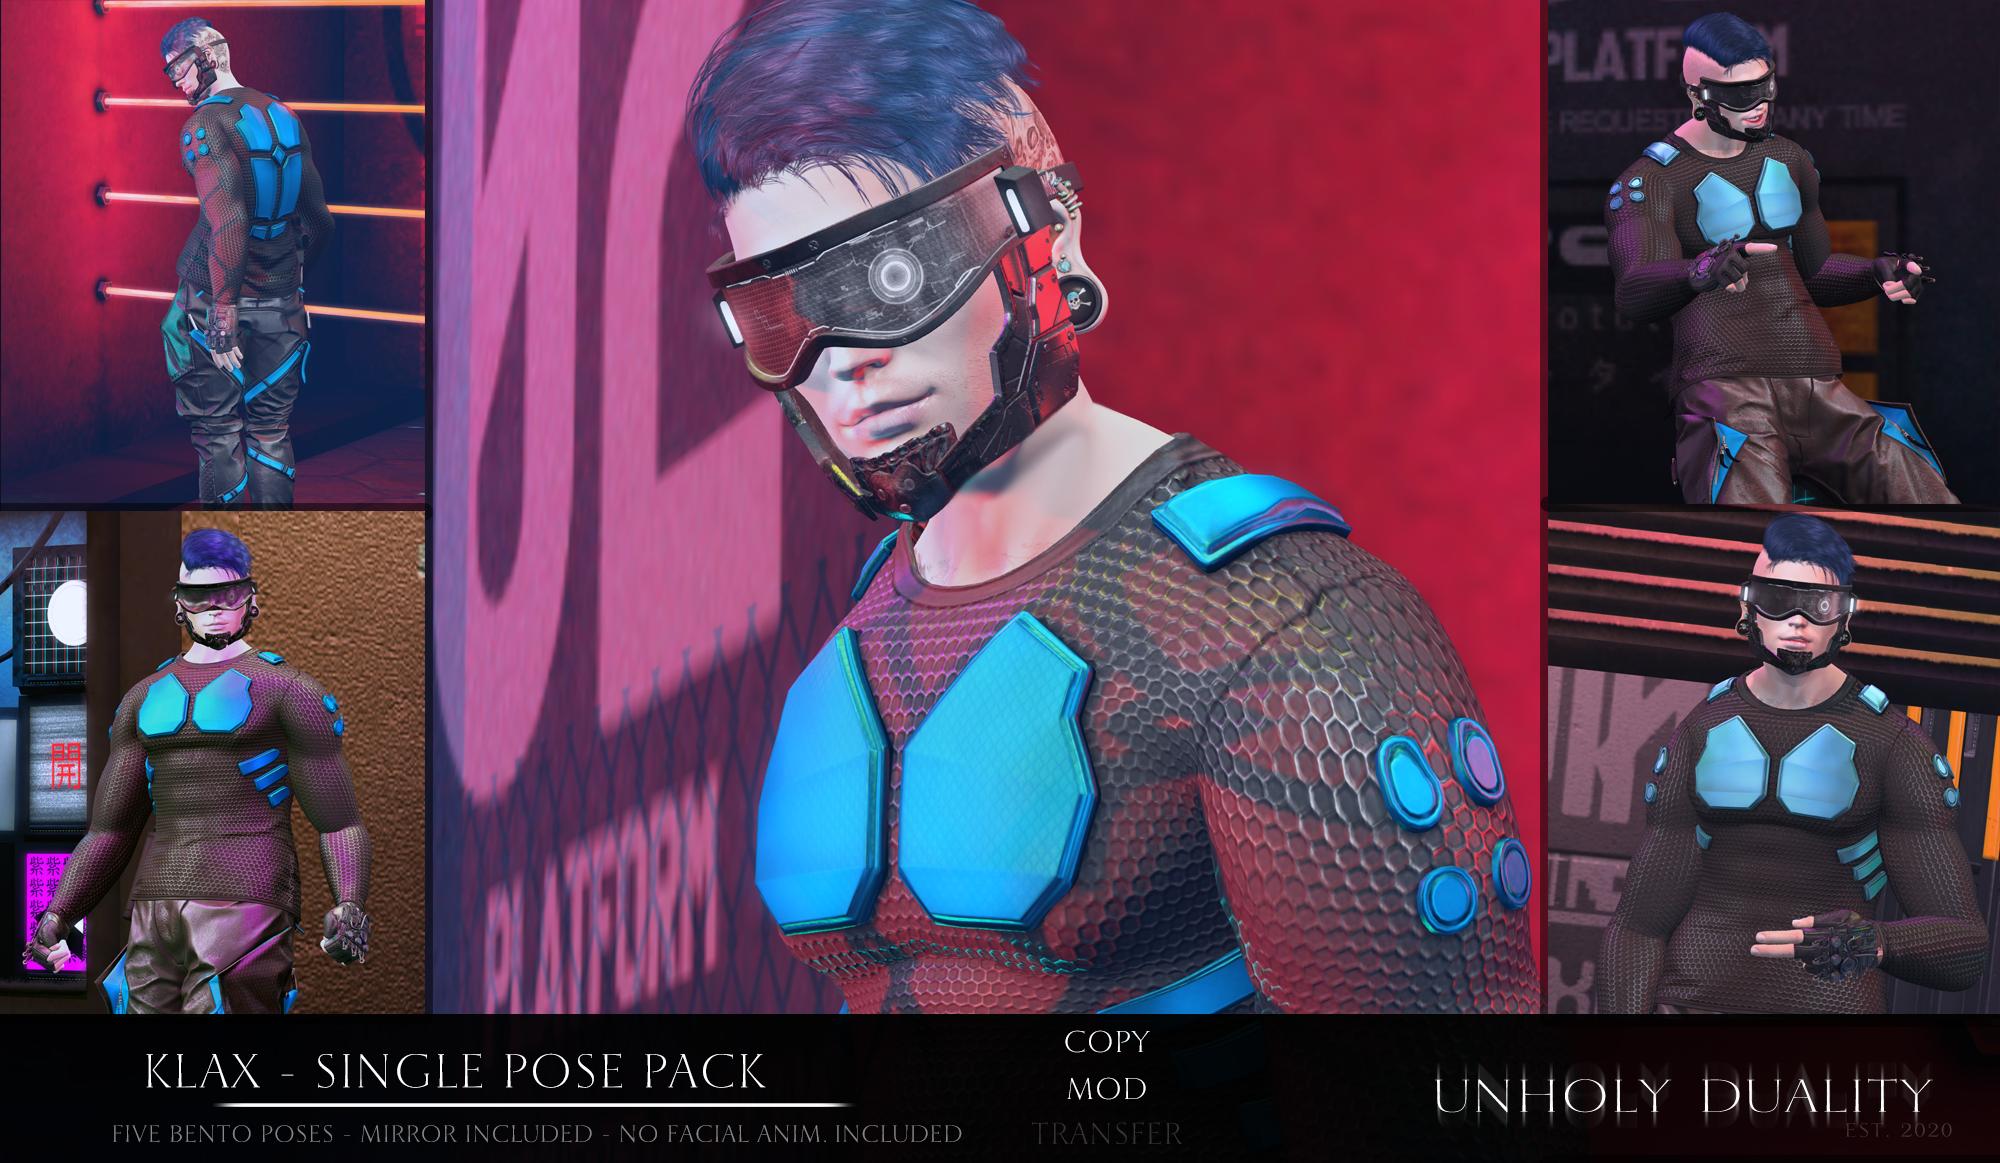 [UD] Klax - Pose Pack AD[3927]